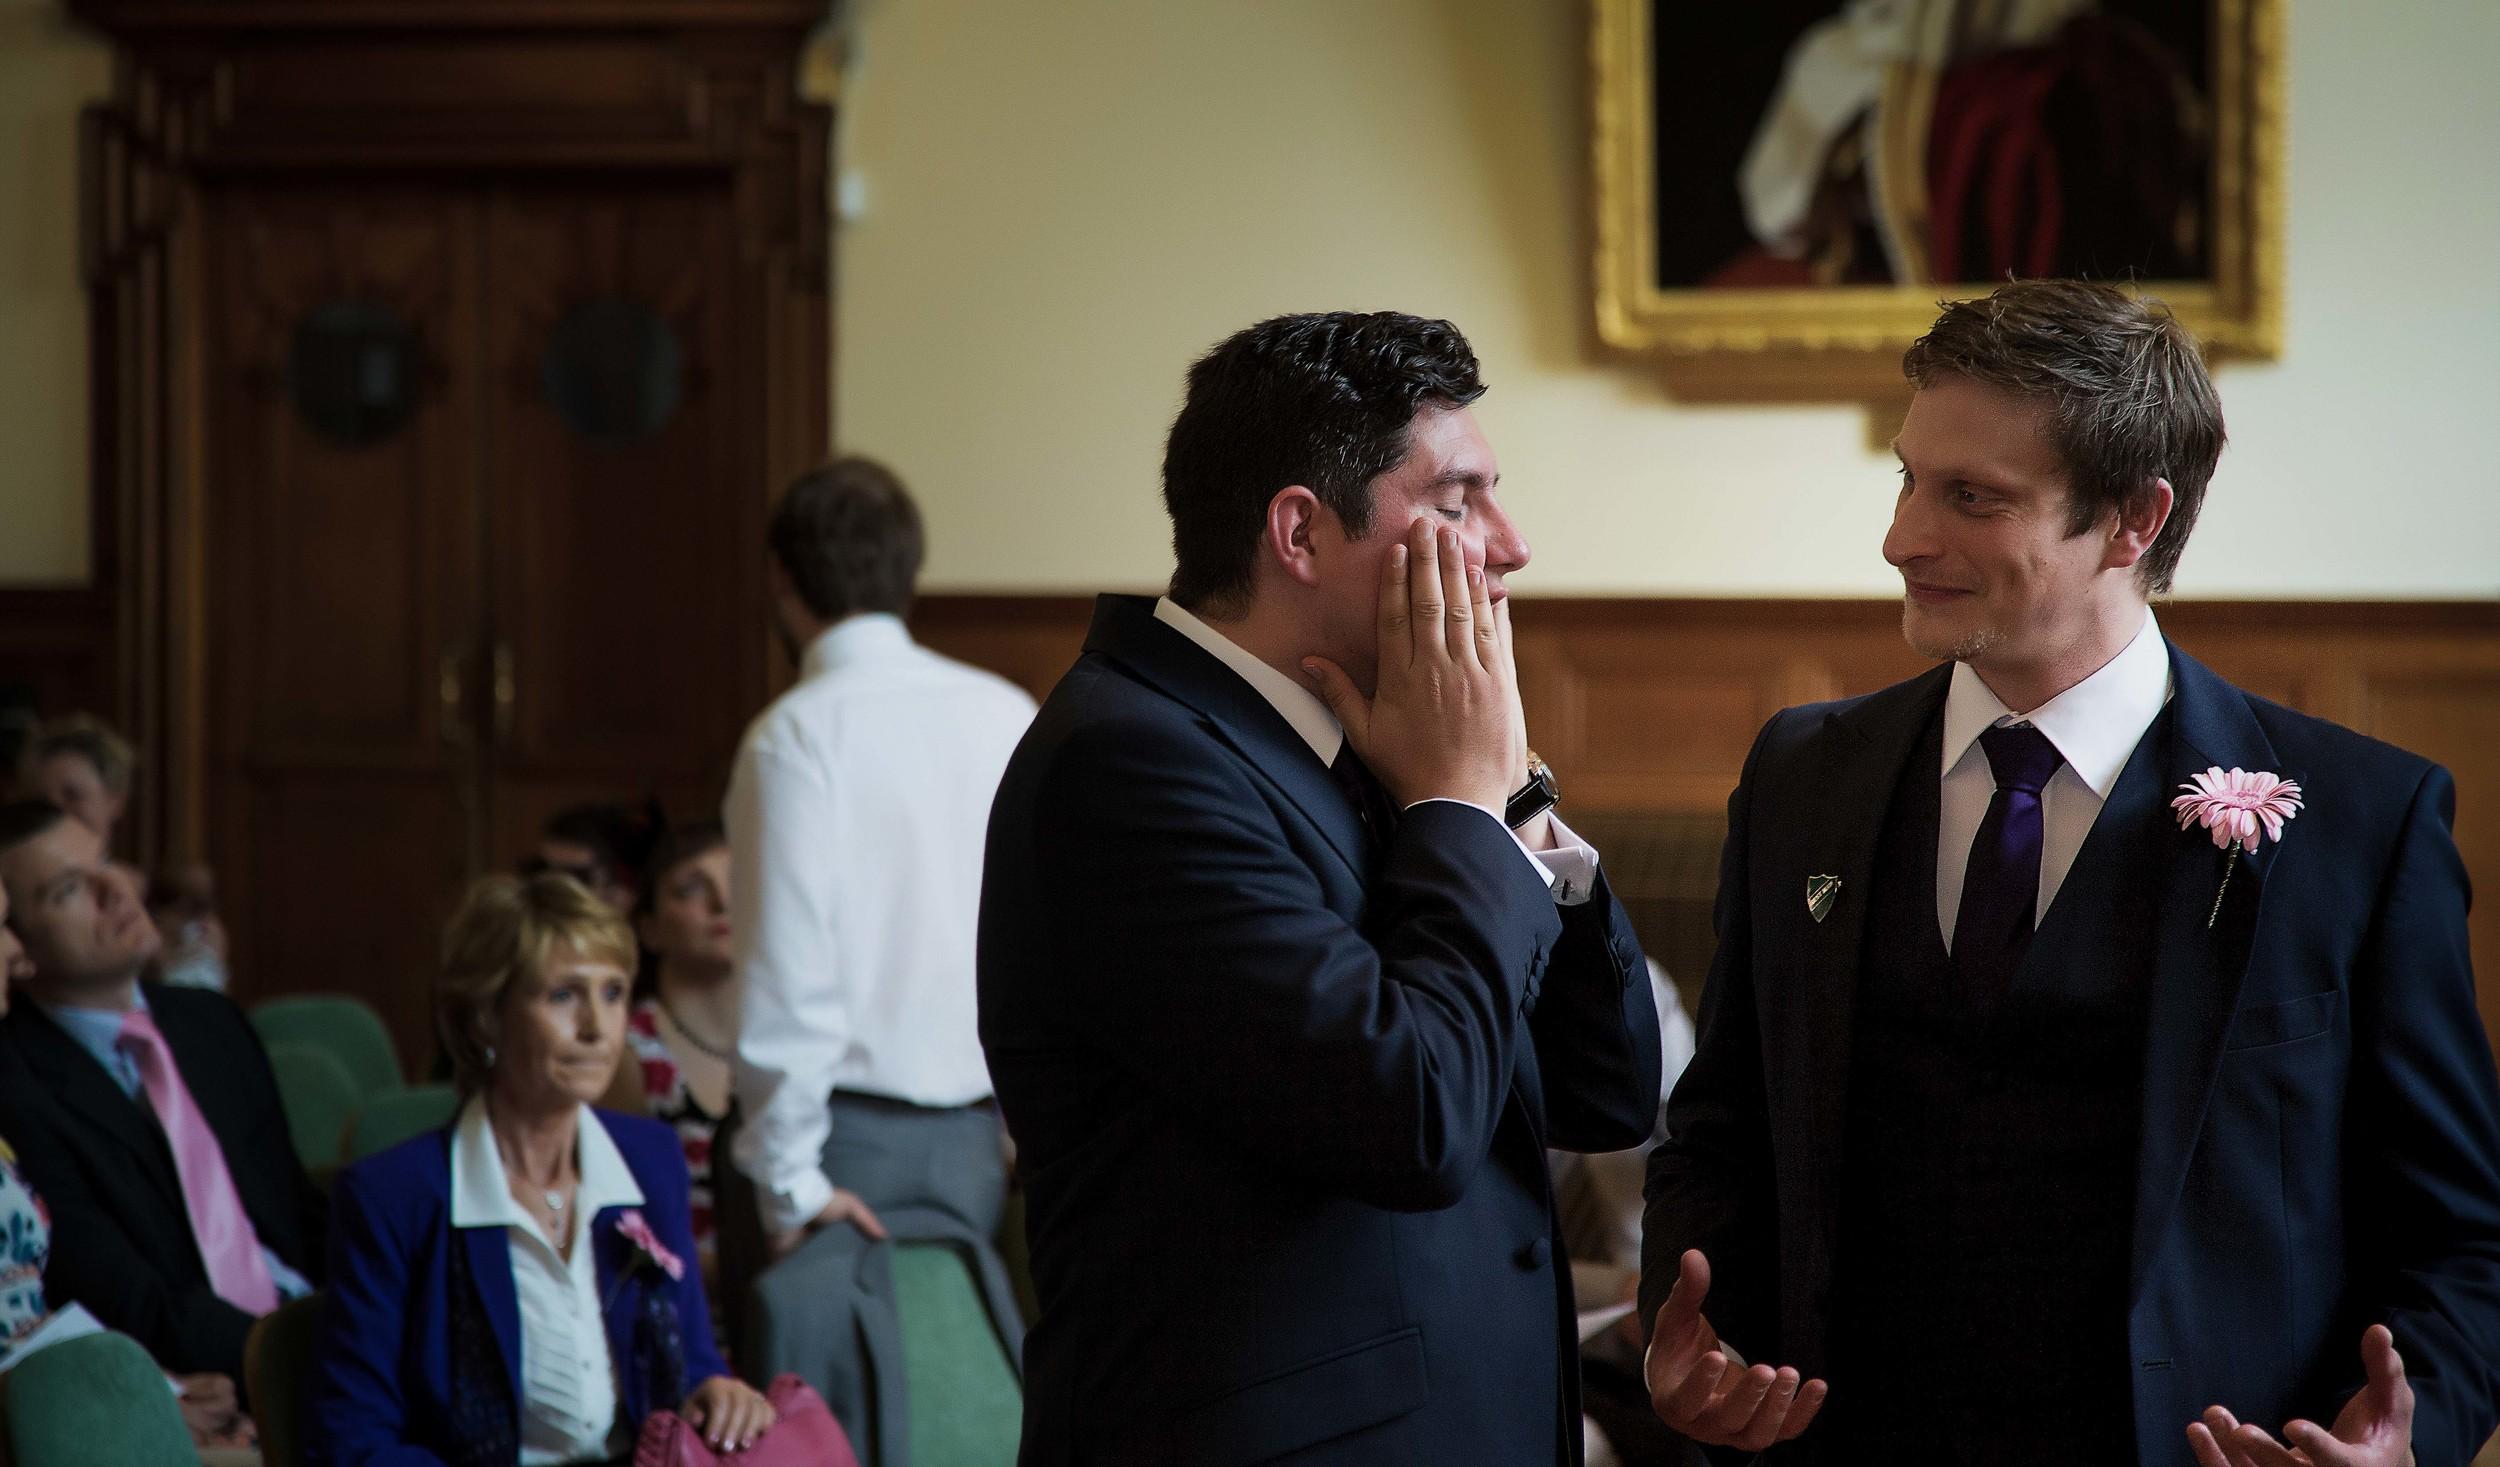 nervous-groom-essex-london-uk-destination-wedding-photography-Adam-Rowley